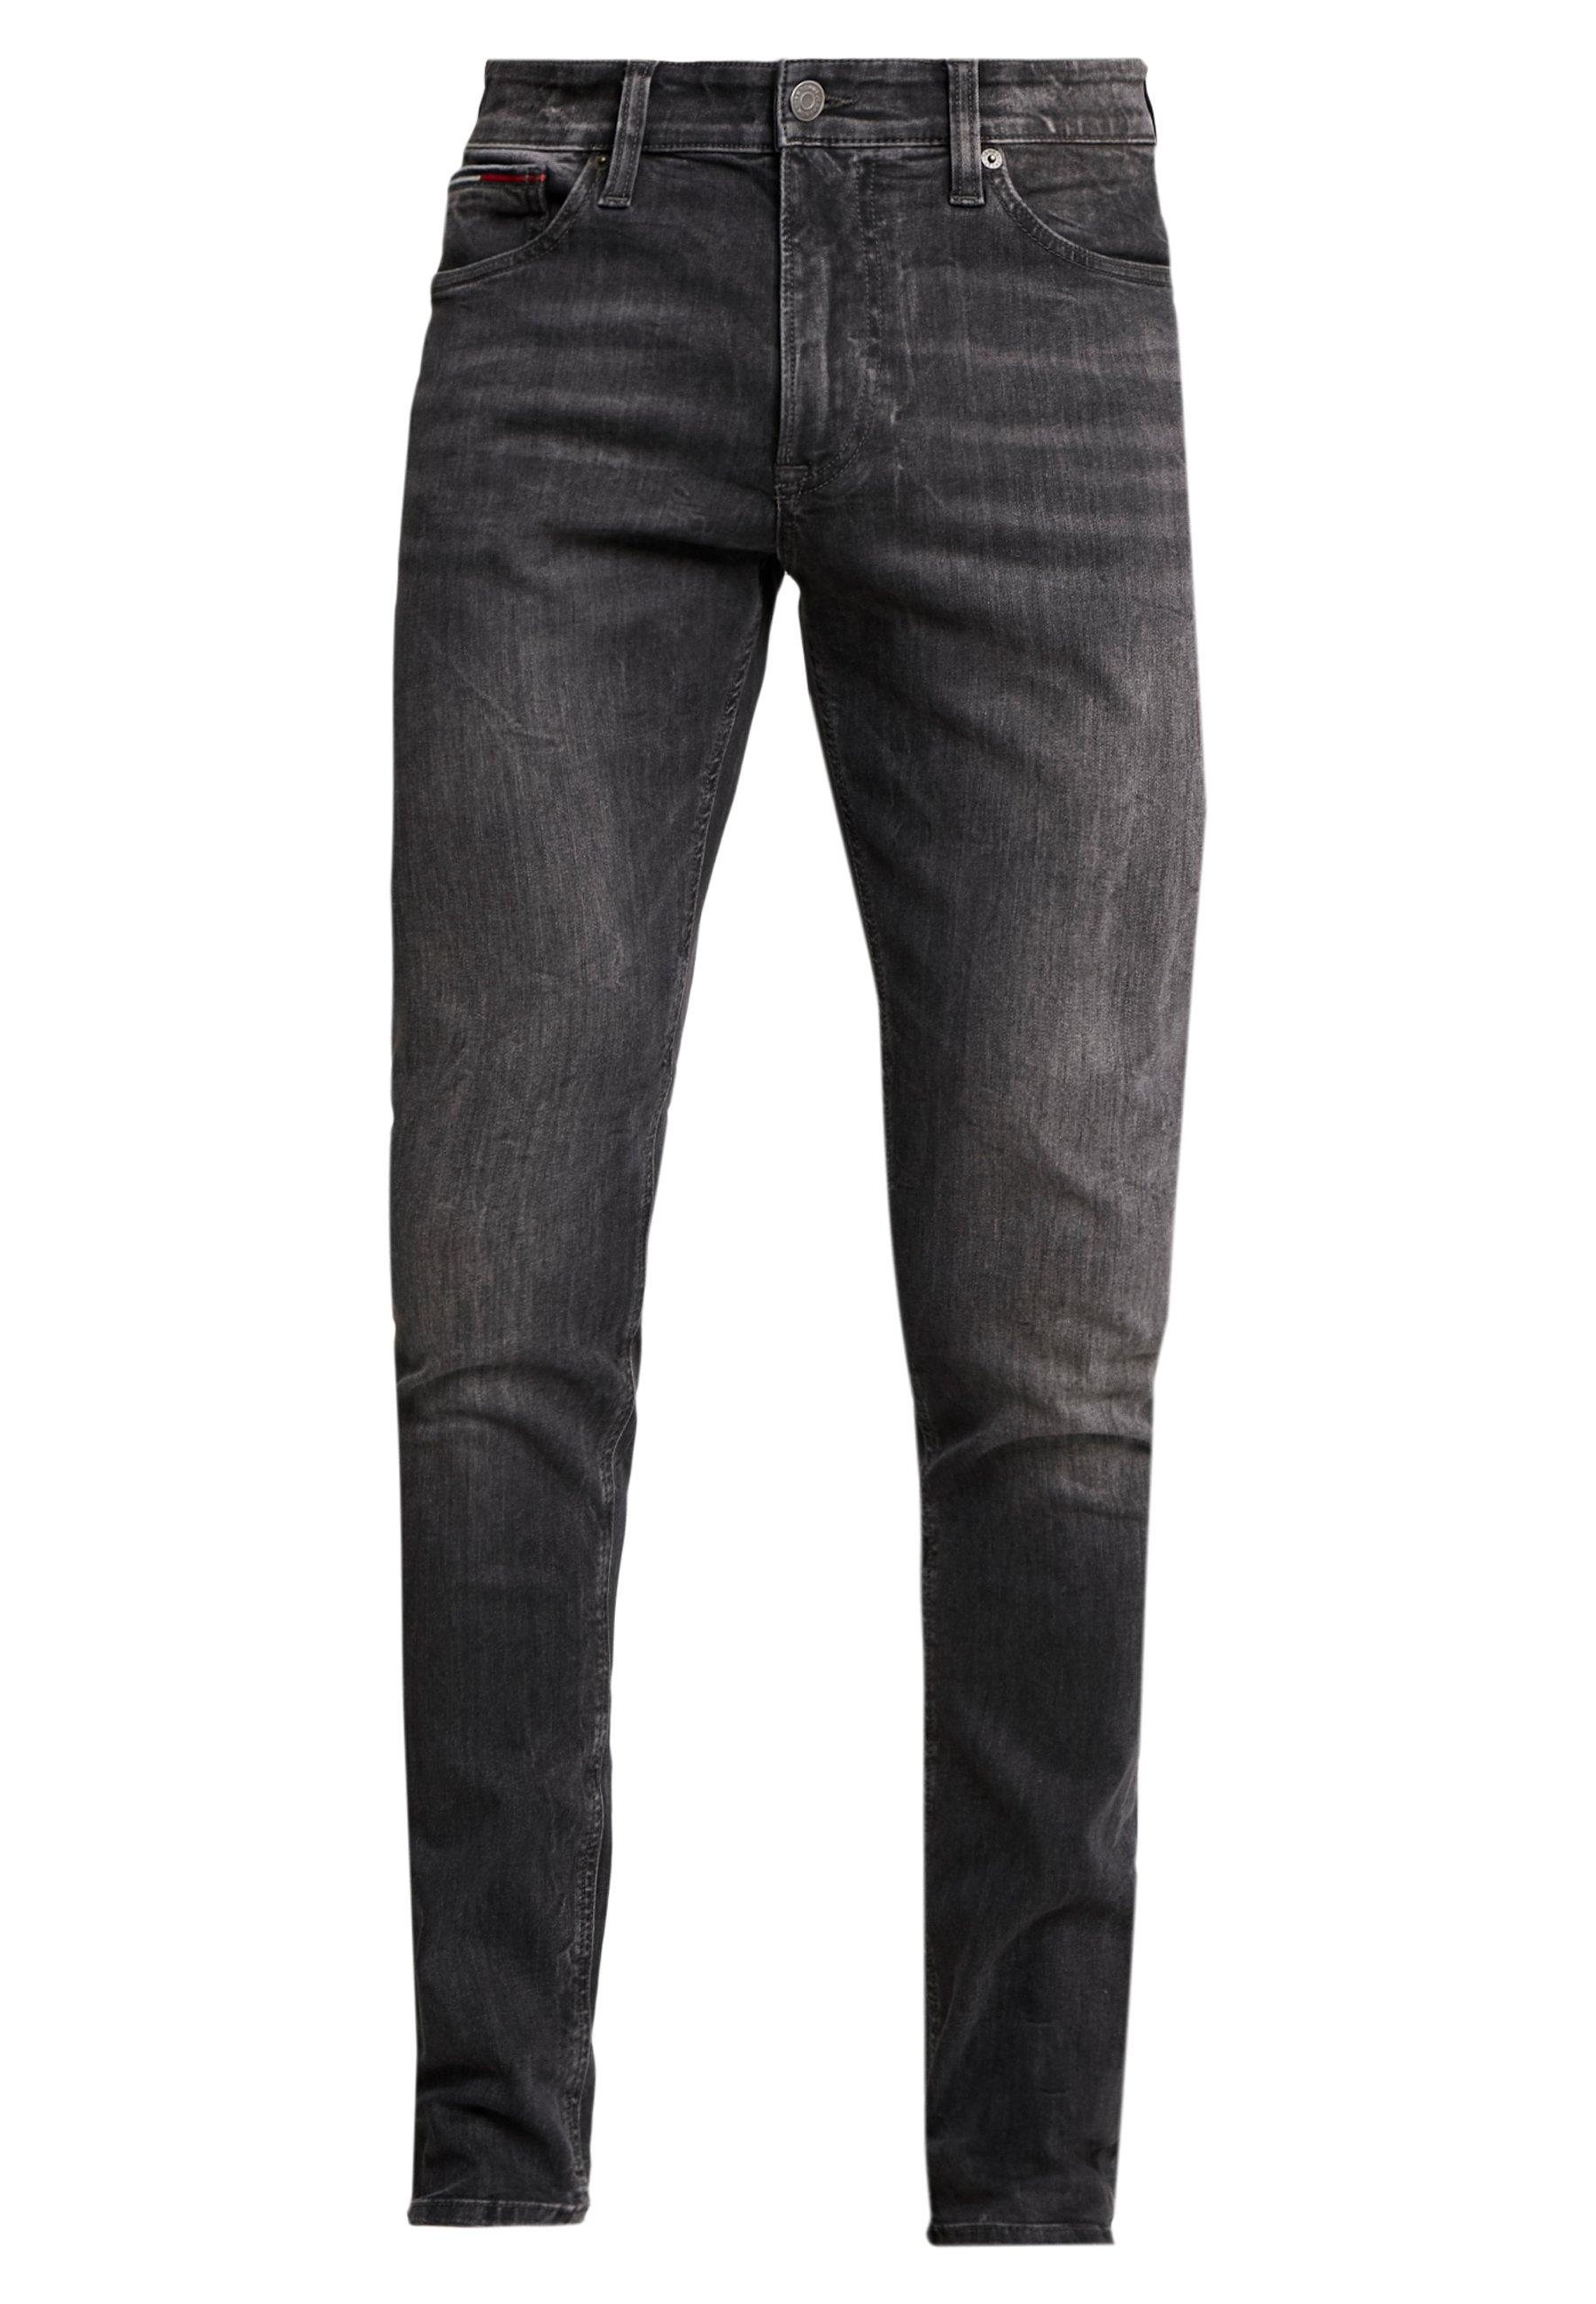 Tommy Jeans Simon - Skinny Fit Black Denim